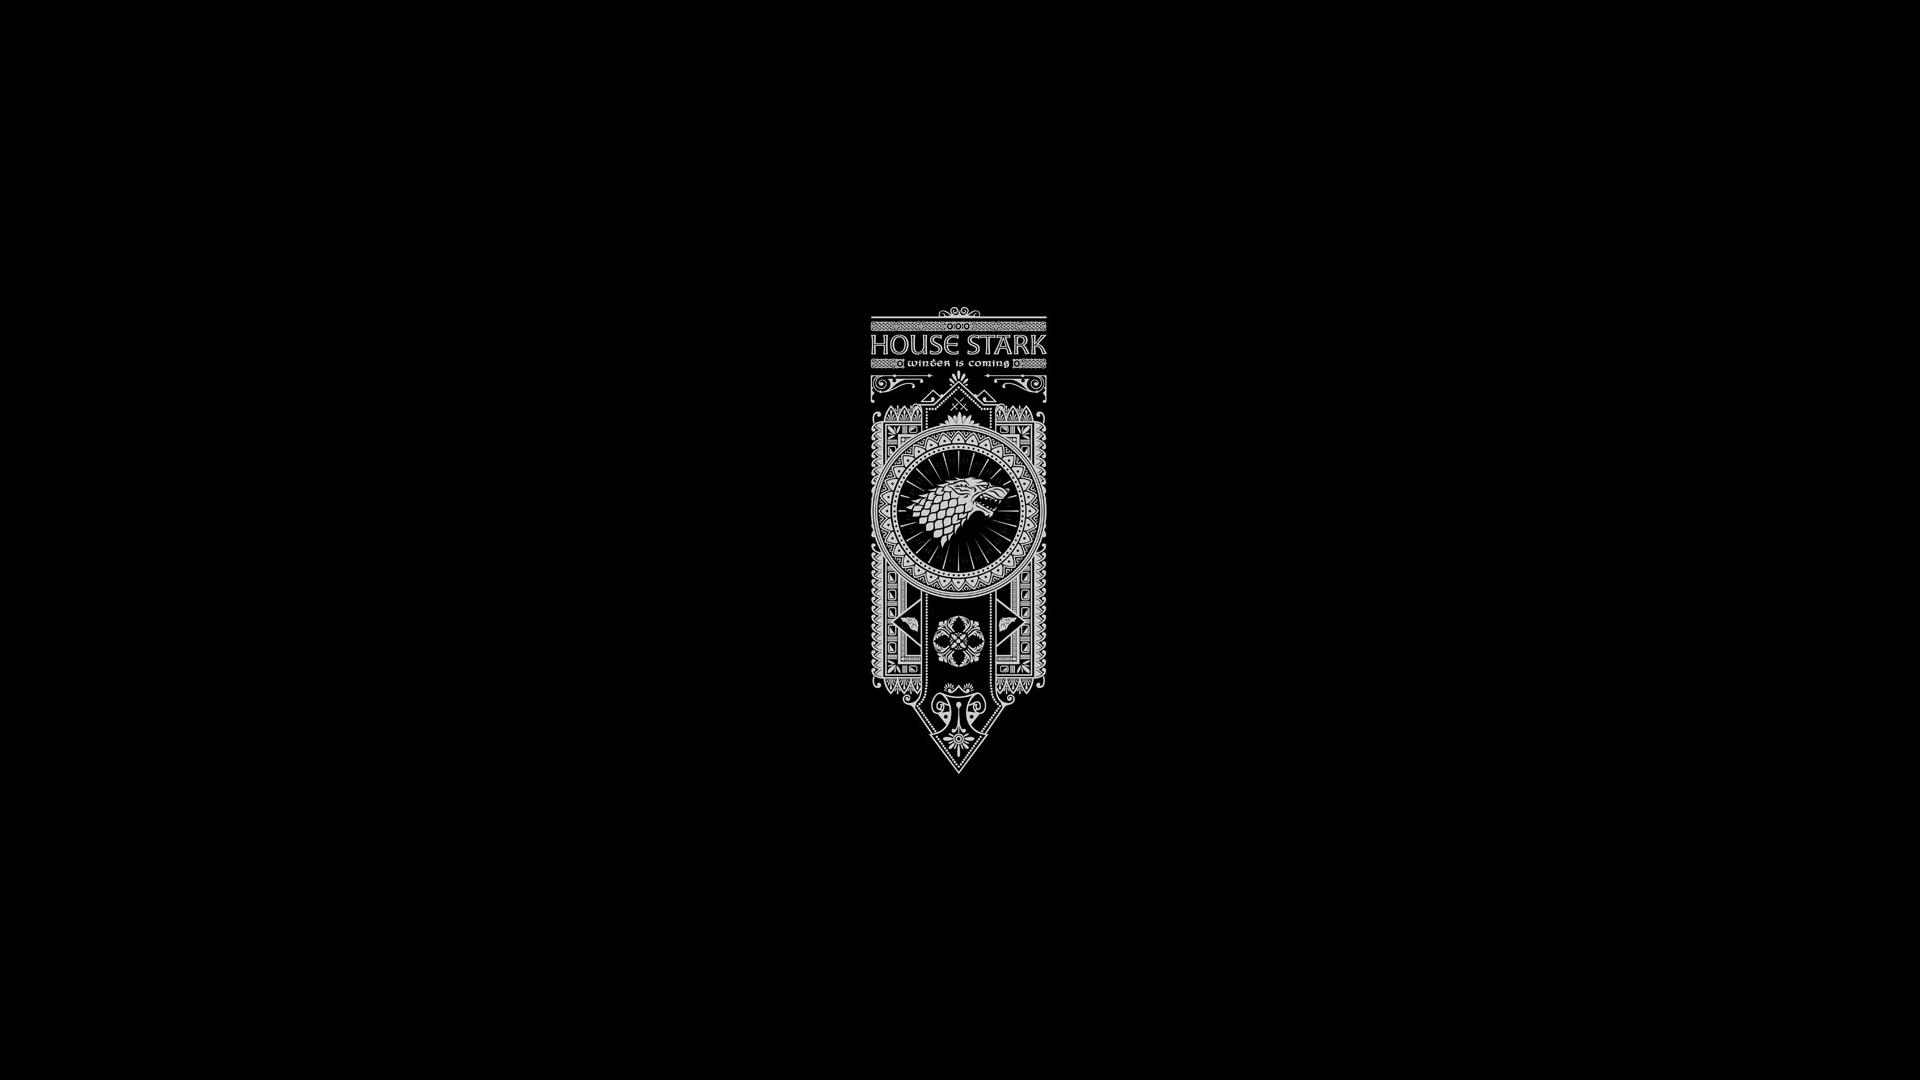 Обои background, tv series, daenerys targaryen, vintage, Game of thrones, minimalism, pinup models, Pinup, dragon, fantasy. Минимализм foto 2